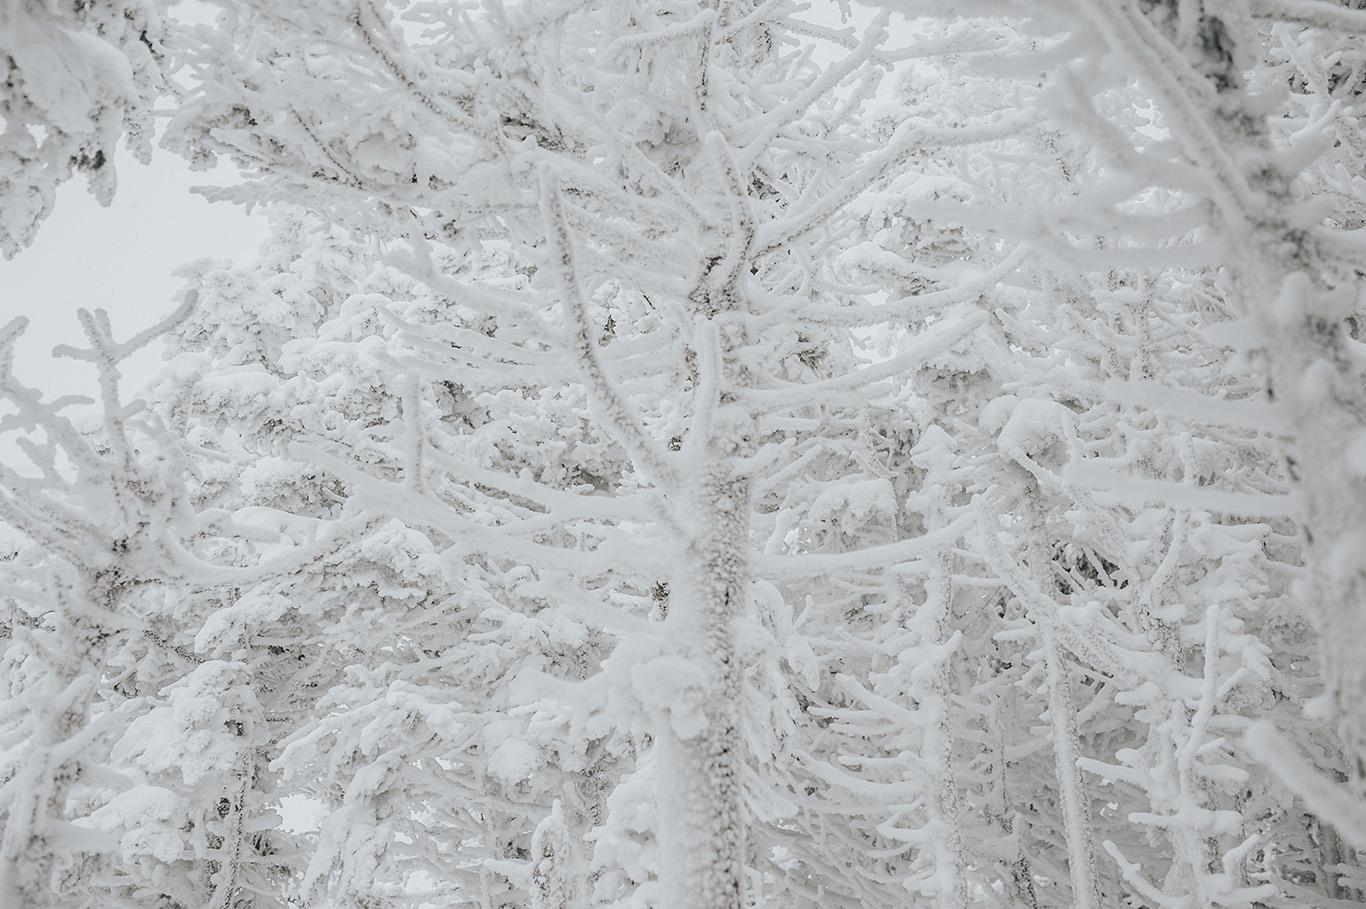 winter-snow-covered-trees-engagement-session-killington-vermont.jpg